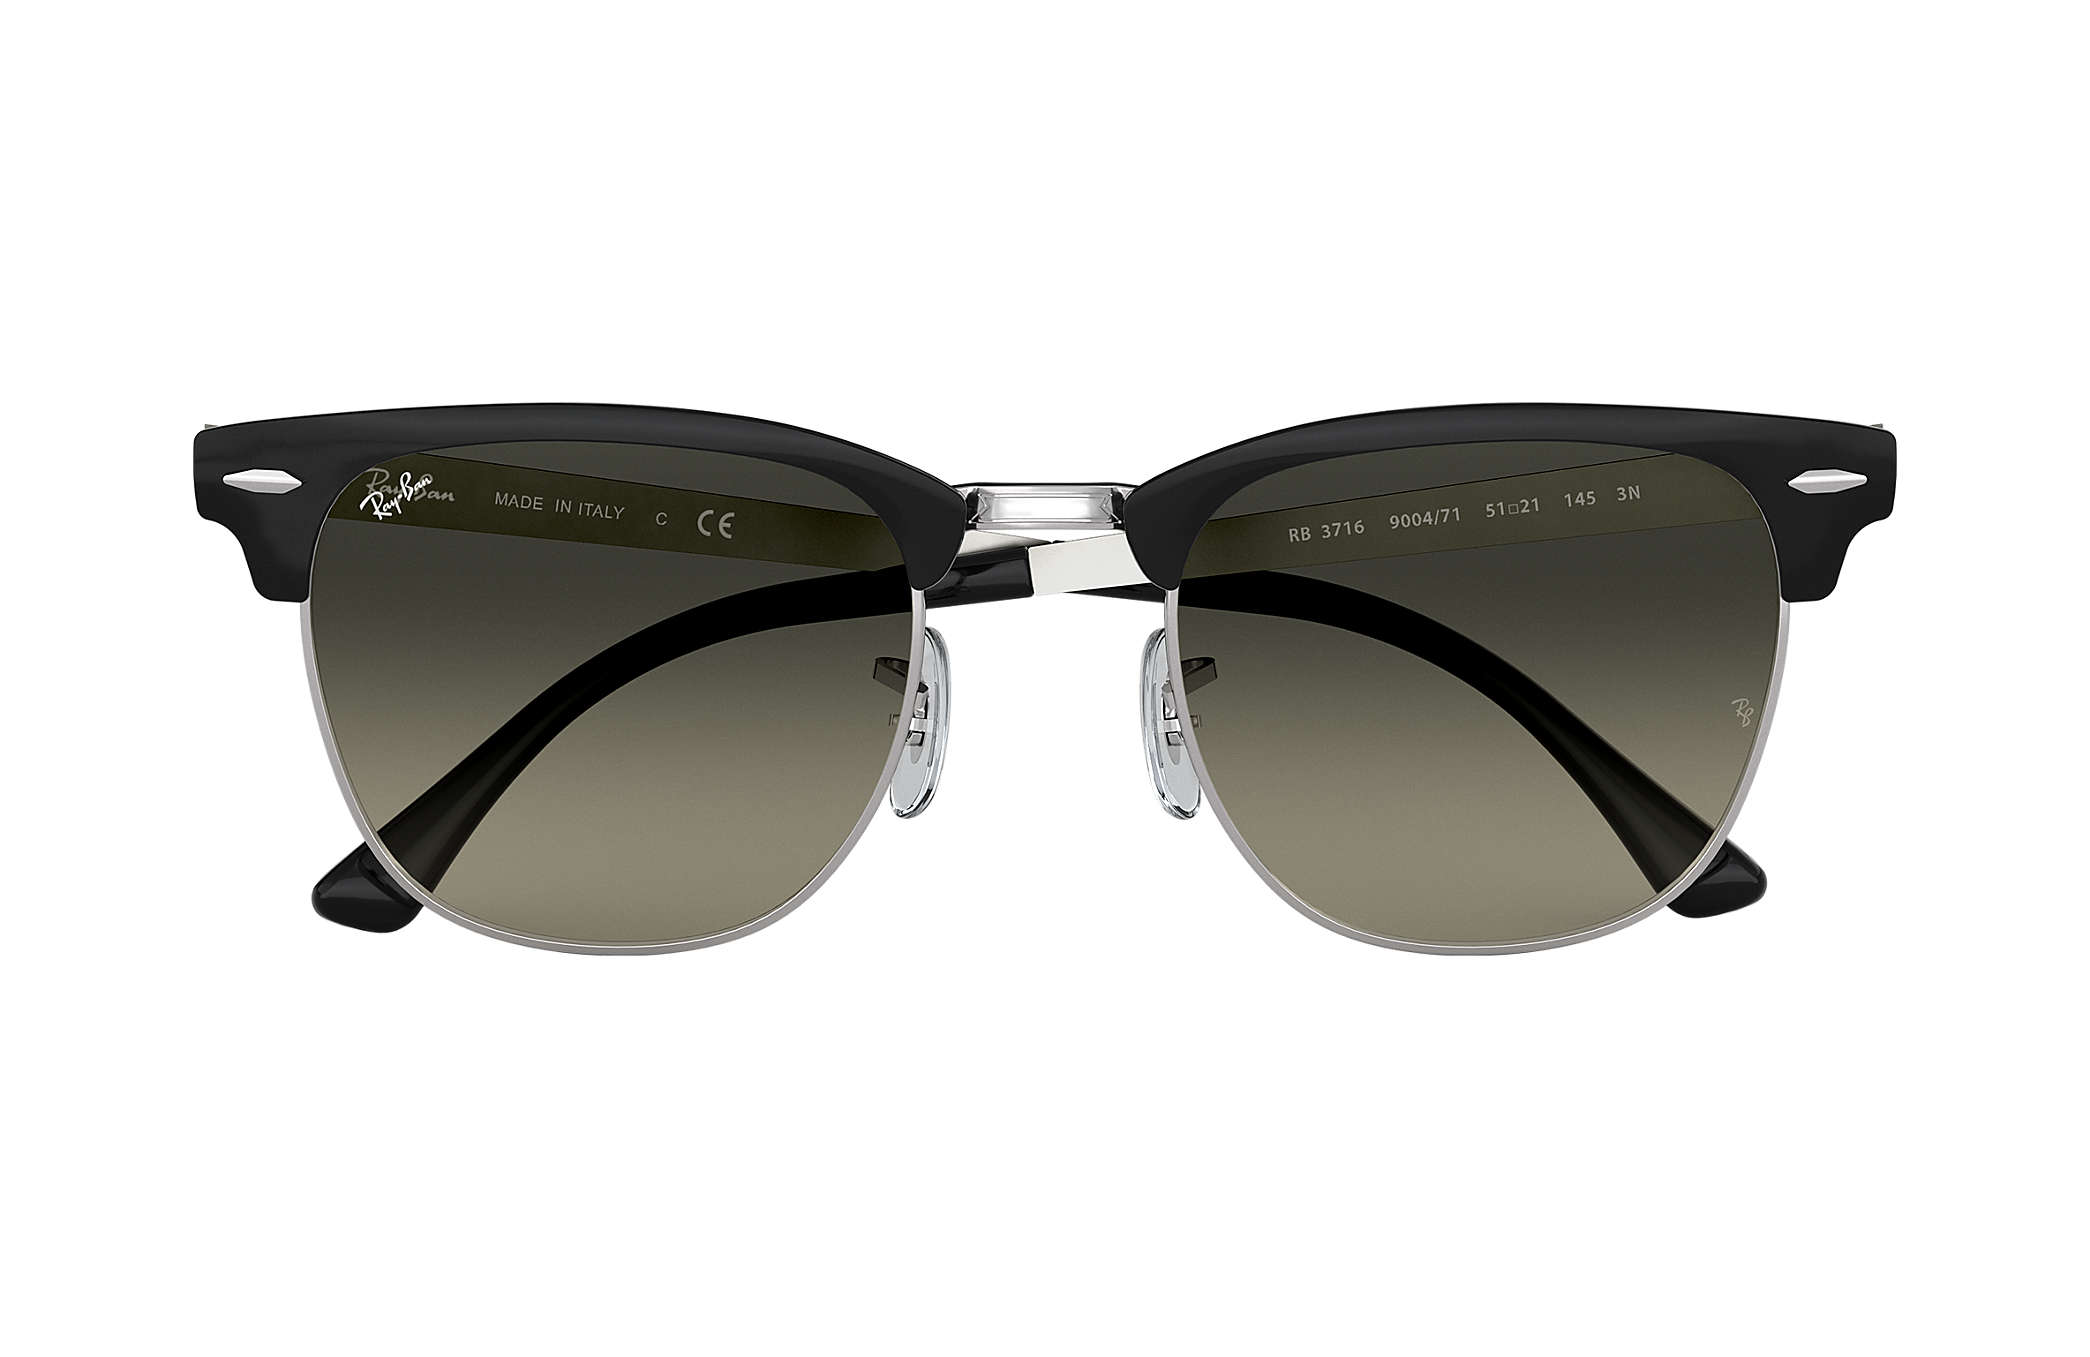 27c8921018 Ray-Ban Clubmaster Metal RB3716 Black - Metal - Grey Lenses ...